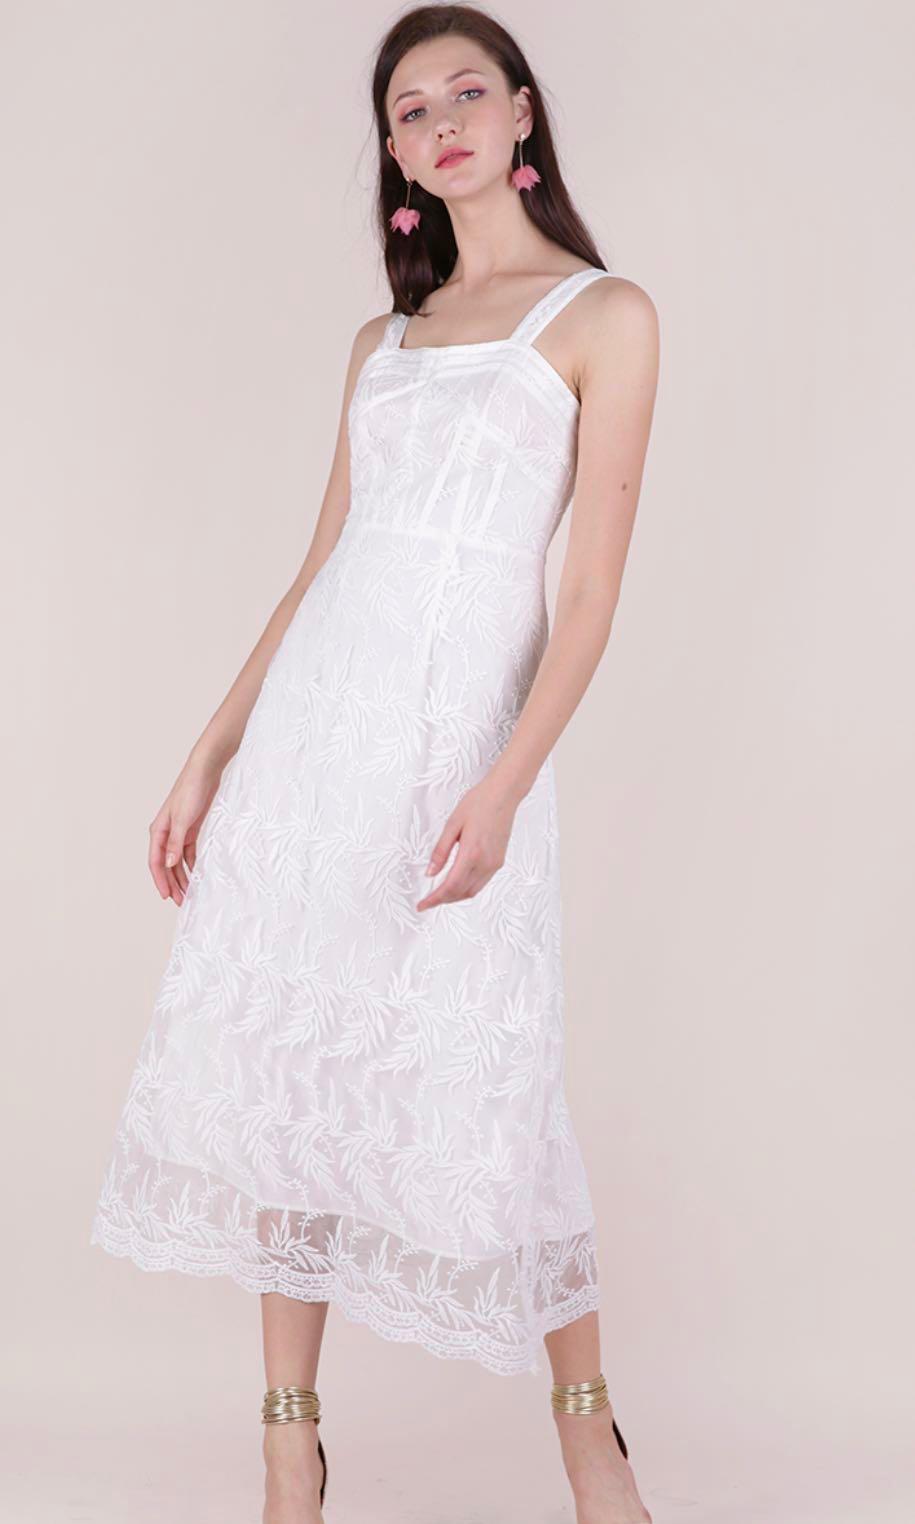 af772b35094 TheTinselRack Isabel Mesh Embroidery Dress (White)